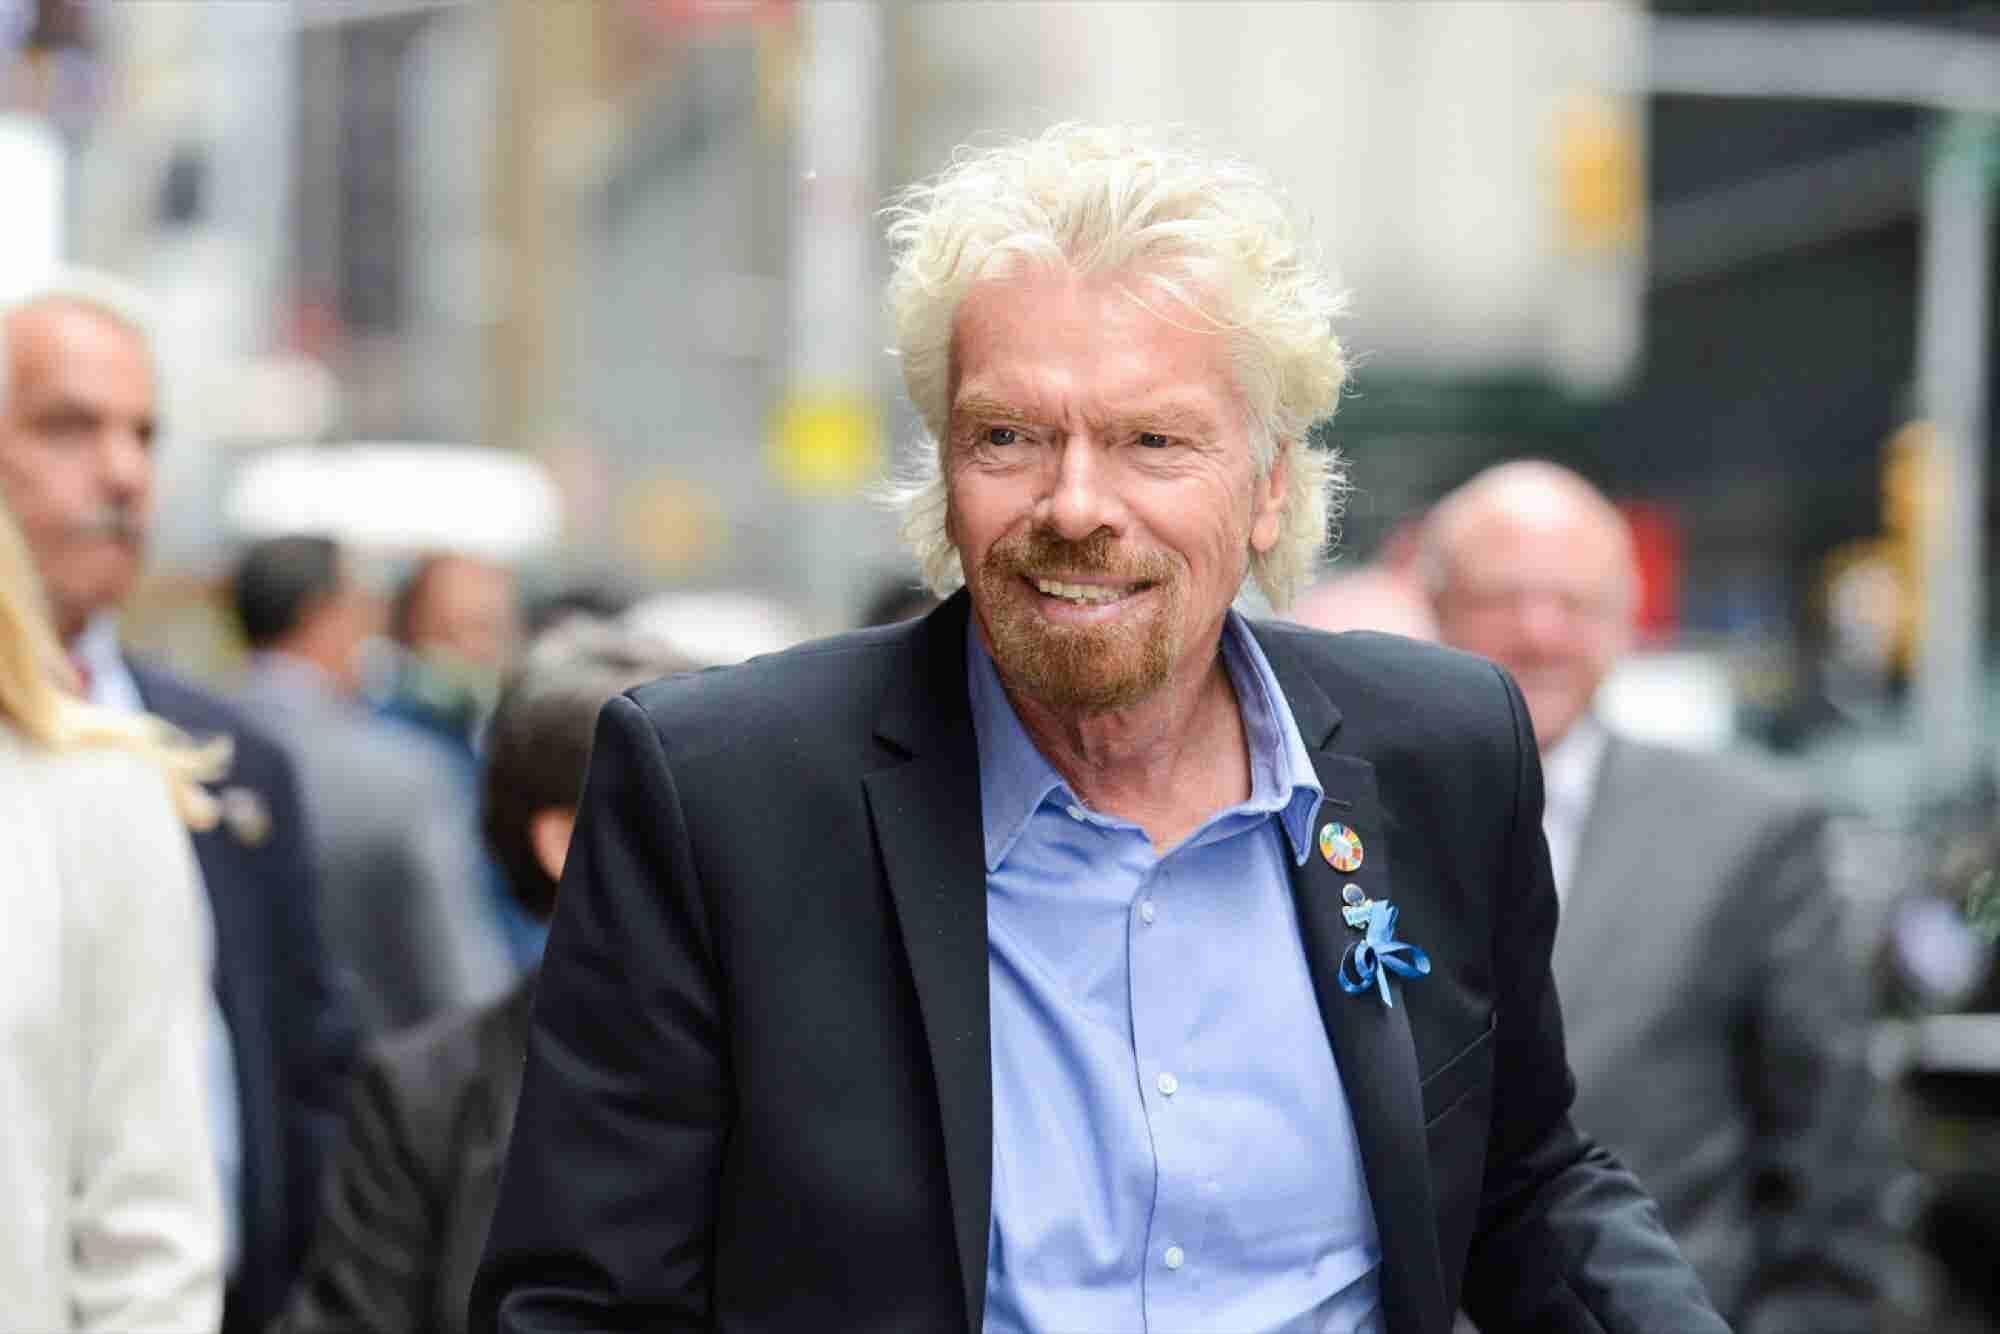 How Richard Branson Built His $5 Billion Fortune